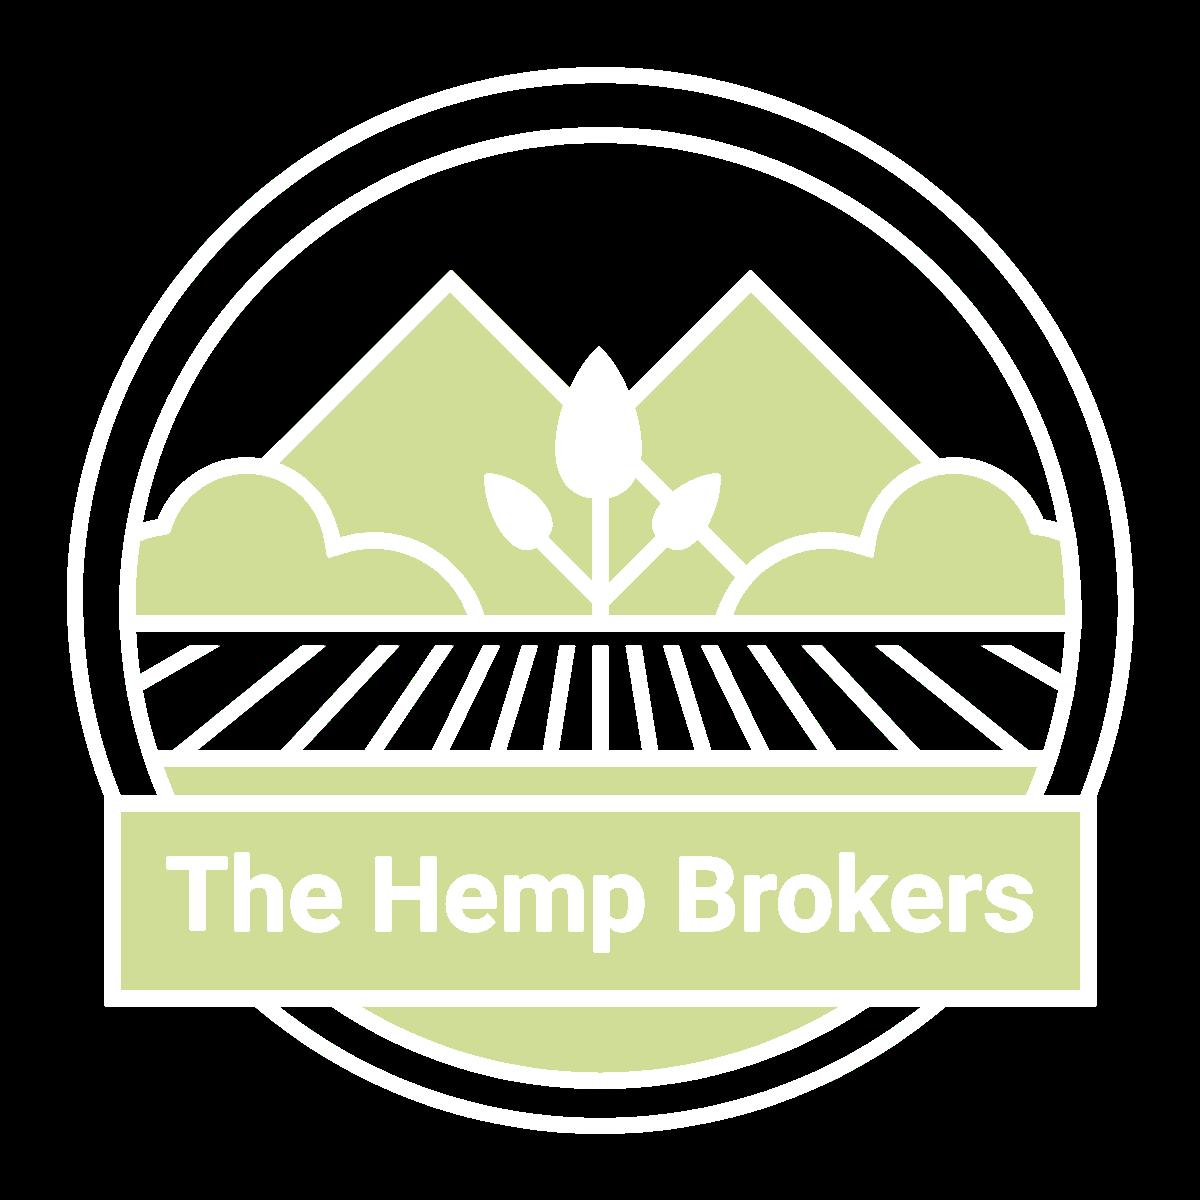 Wholesale — The Hemp Brokers - Number One Wholesalers of Hemp Products